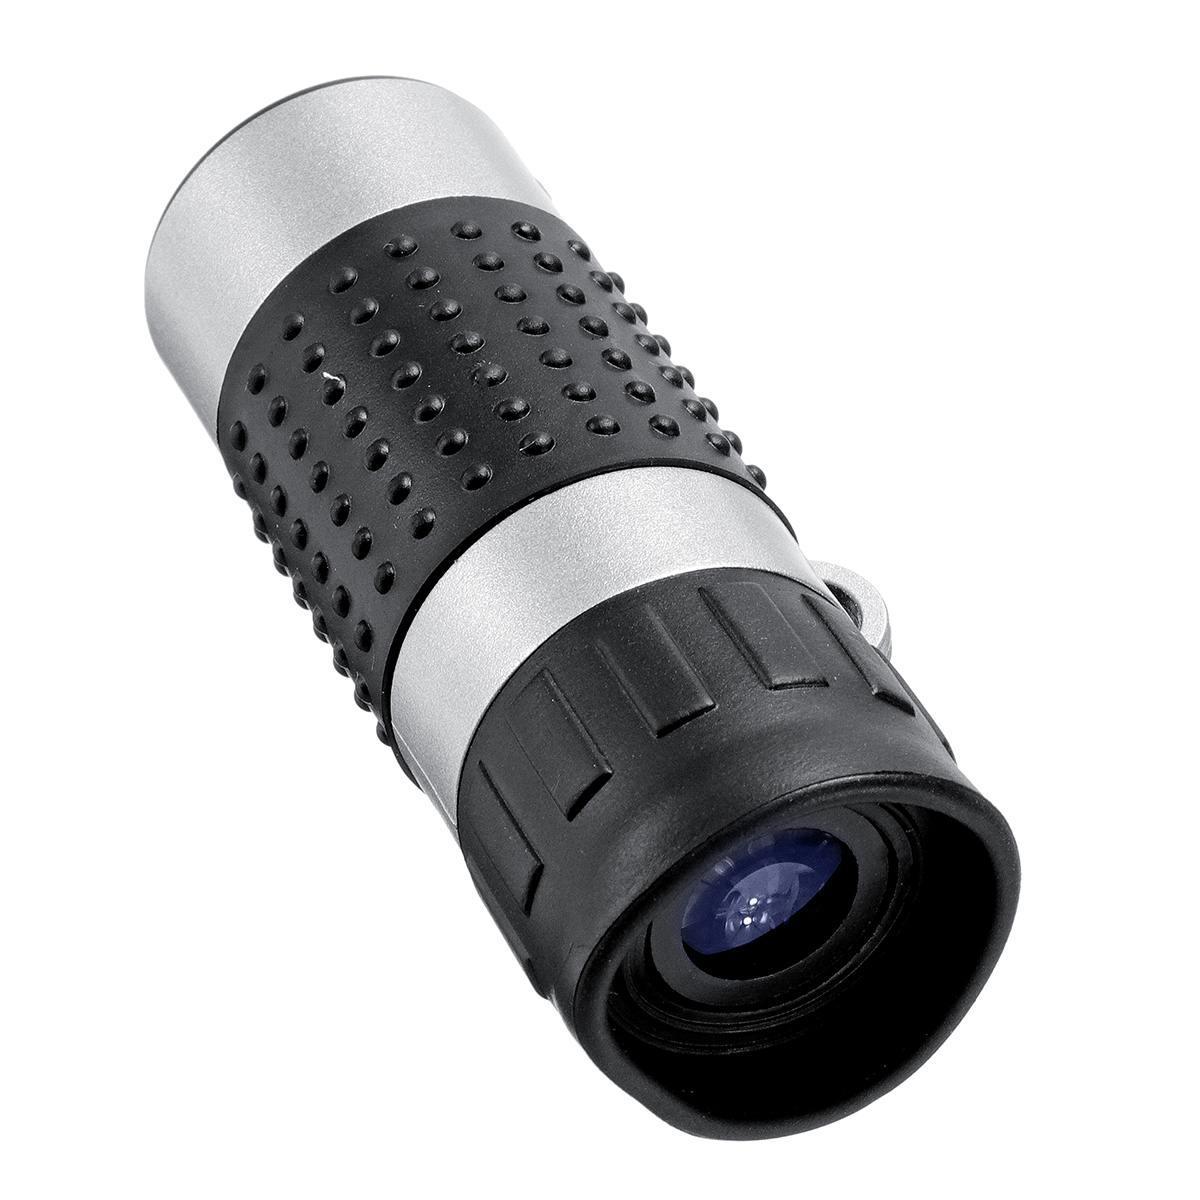 7x18 163m/1000m <font><b>Golf</b></font> Rangefinder Distance Binocular Pocket-Scope <font><b>Range</b></font> Surveillance